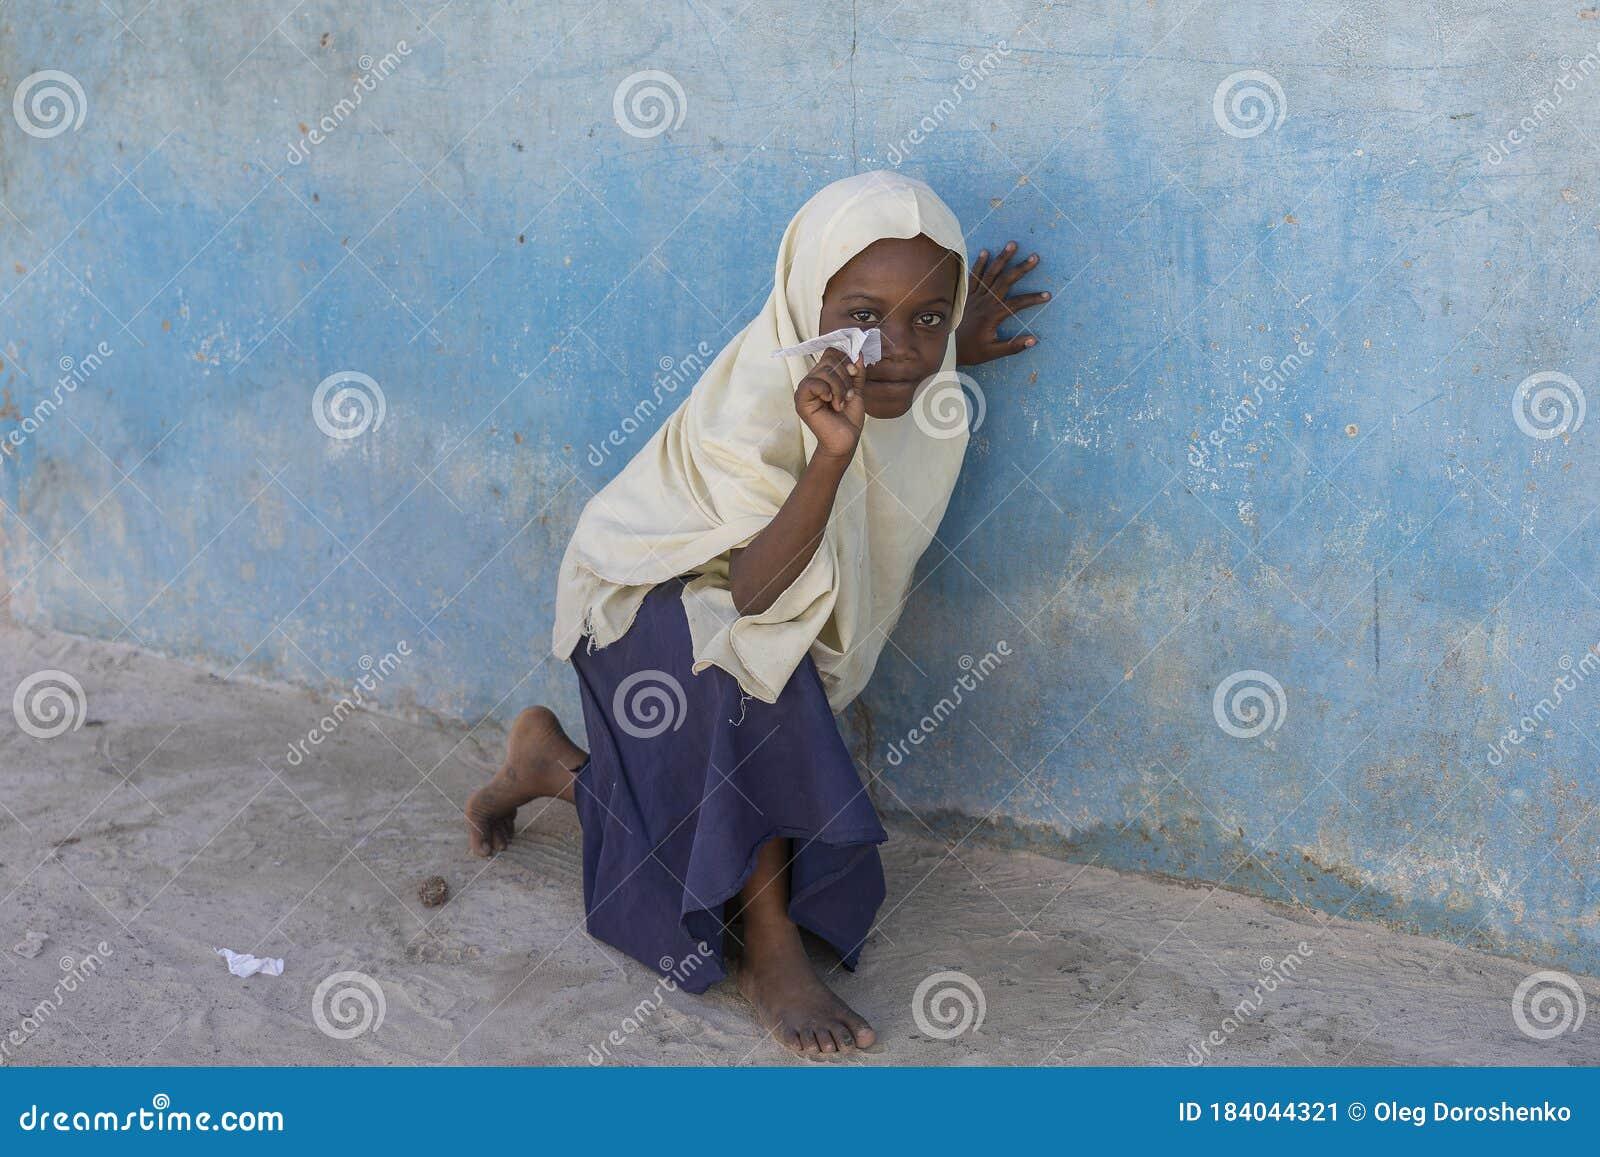 Tanzania, Zanzibar Island, portrait of girl lying on the